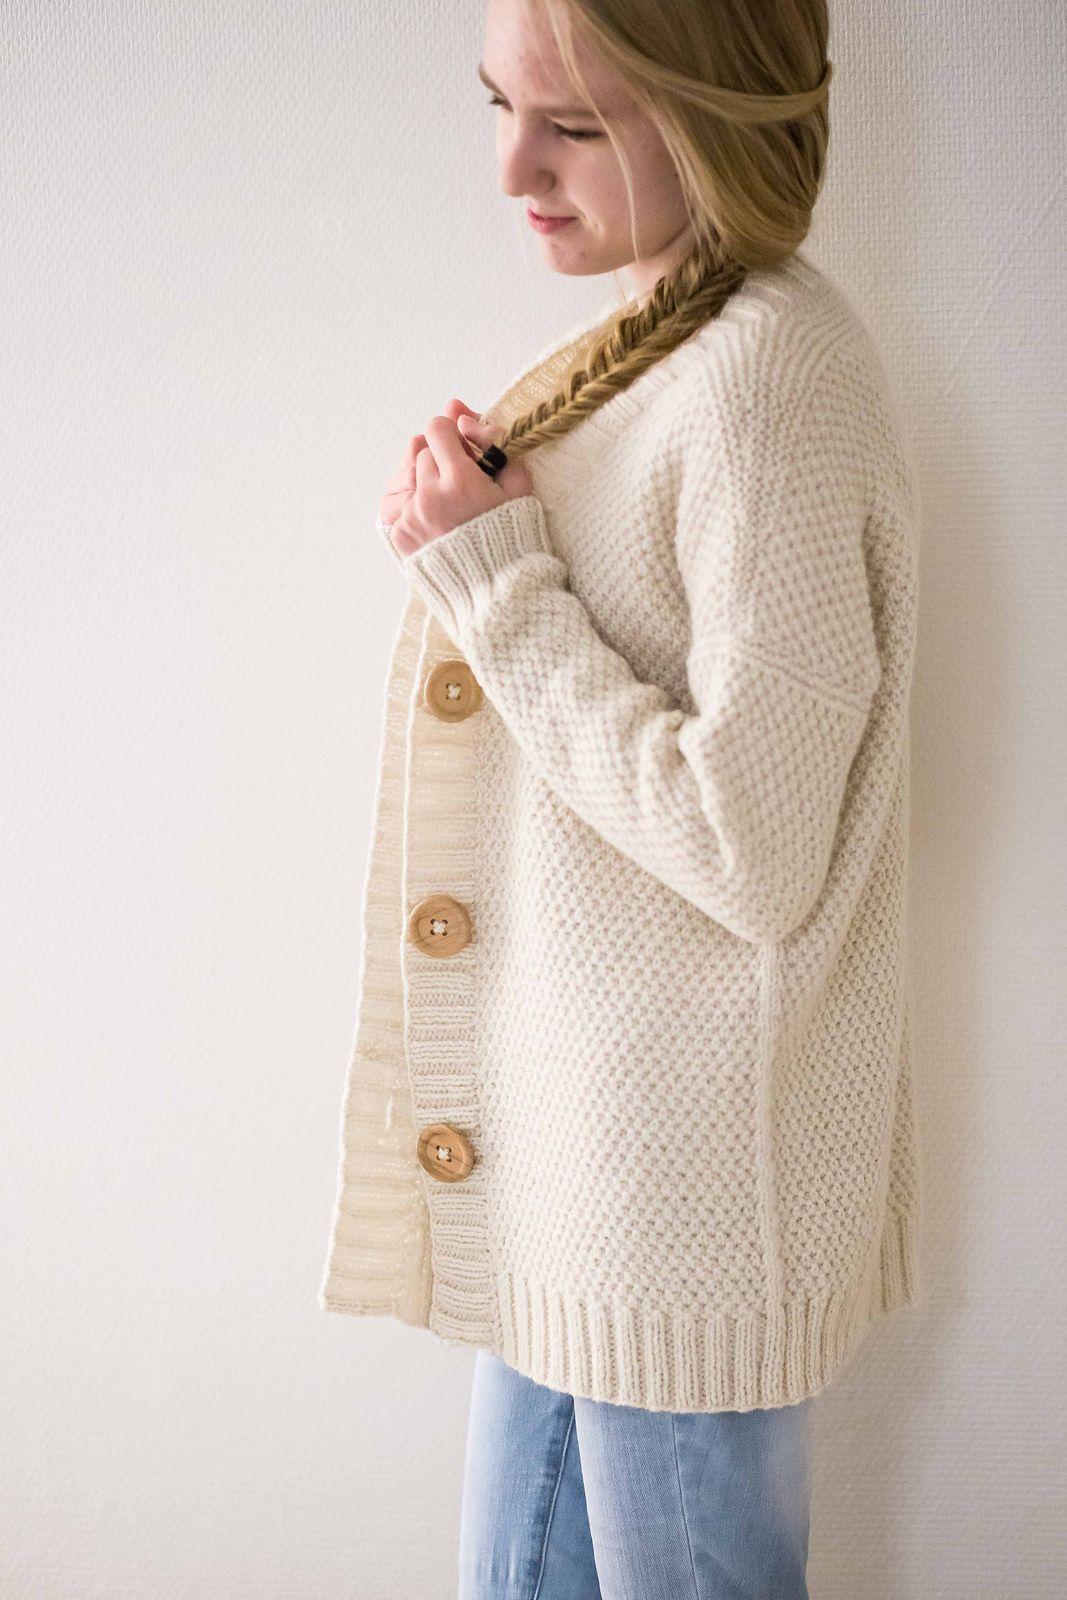 Schnee pattern by Suvi Simola | Ravelry, Patterns and Crochet